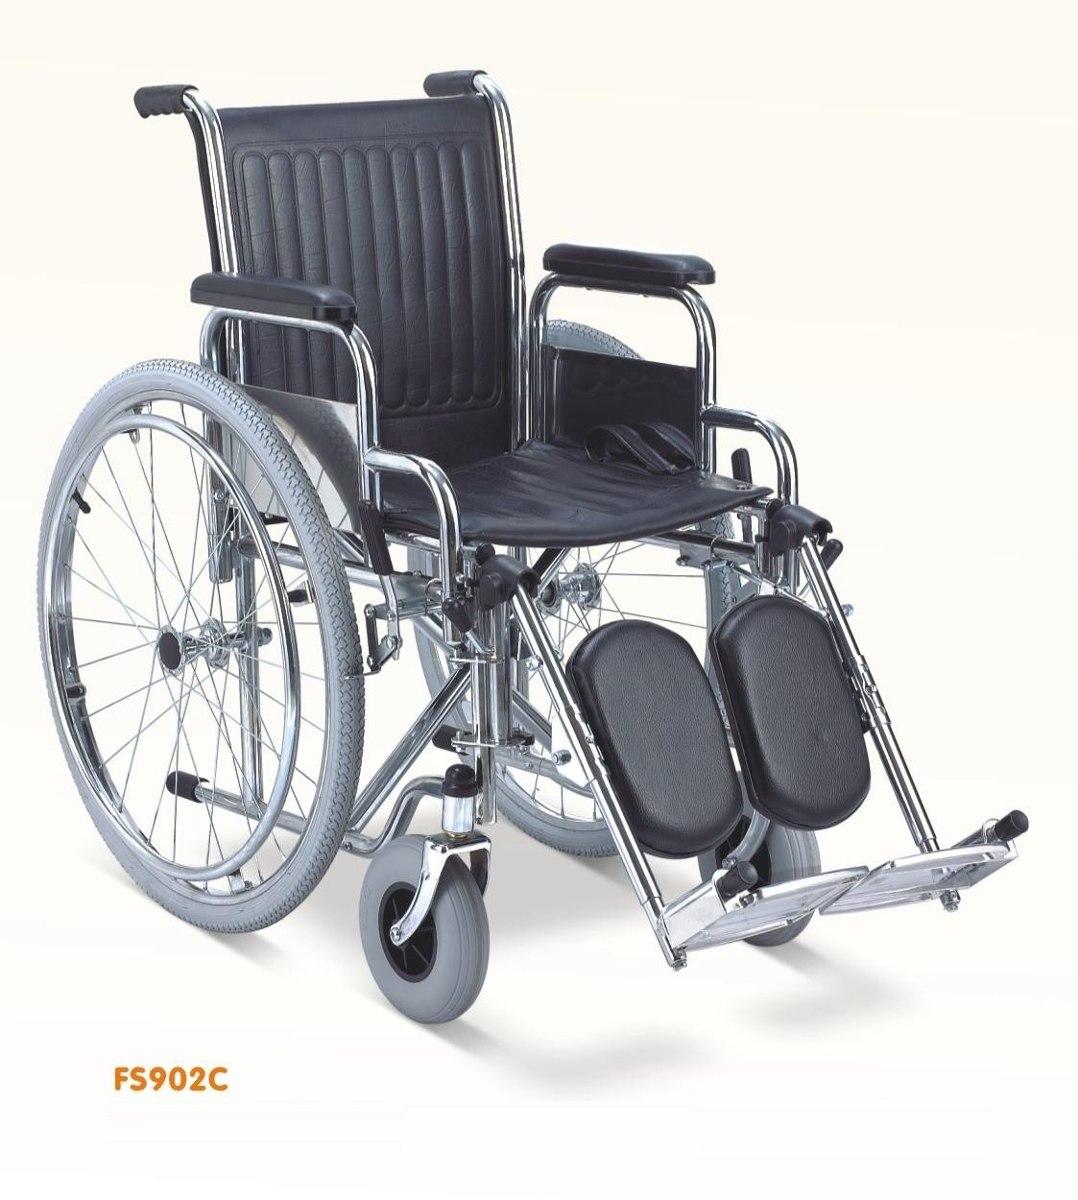 Silla de ruedas en alquiler s 40 00 en mercado libre for Pisos de alquiler en silla